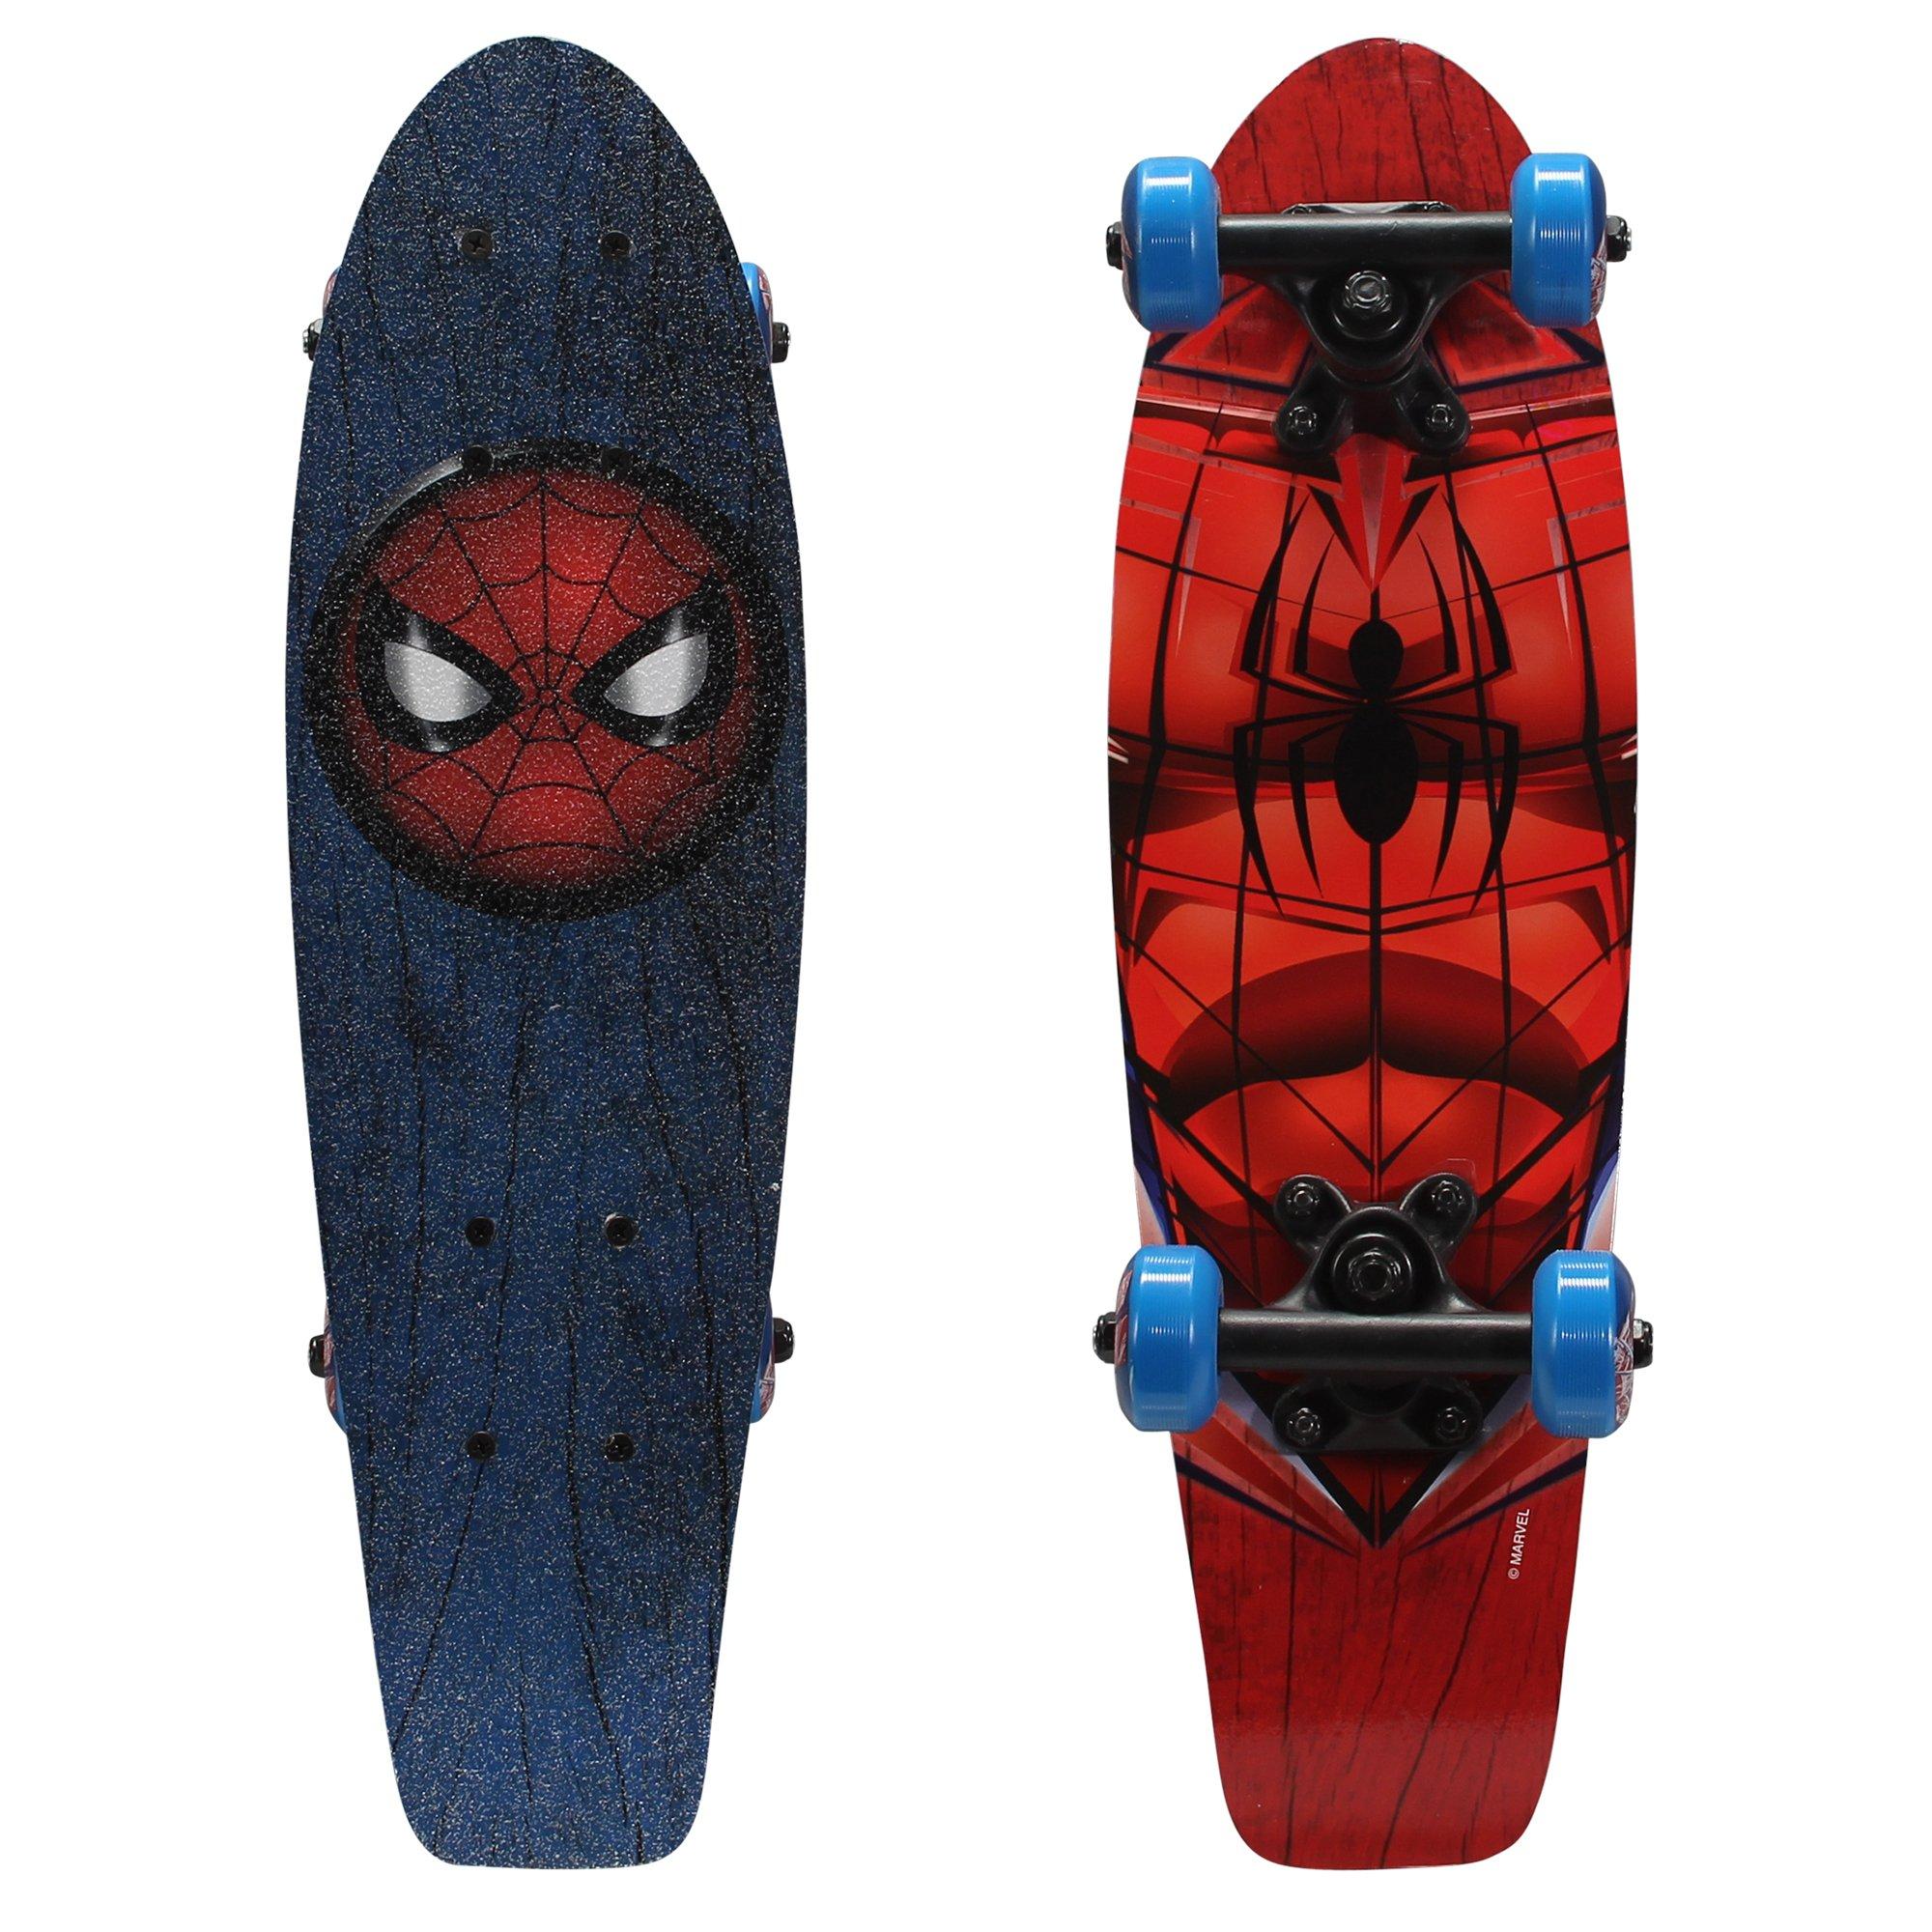 PlayWheels Ultimate Spider-Man 21'' Wood Cruiser Skateboard, Spidey Eyes